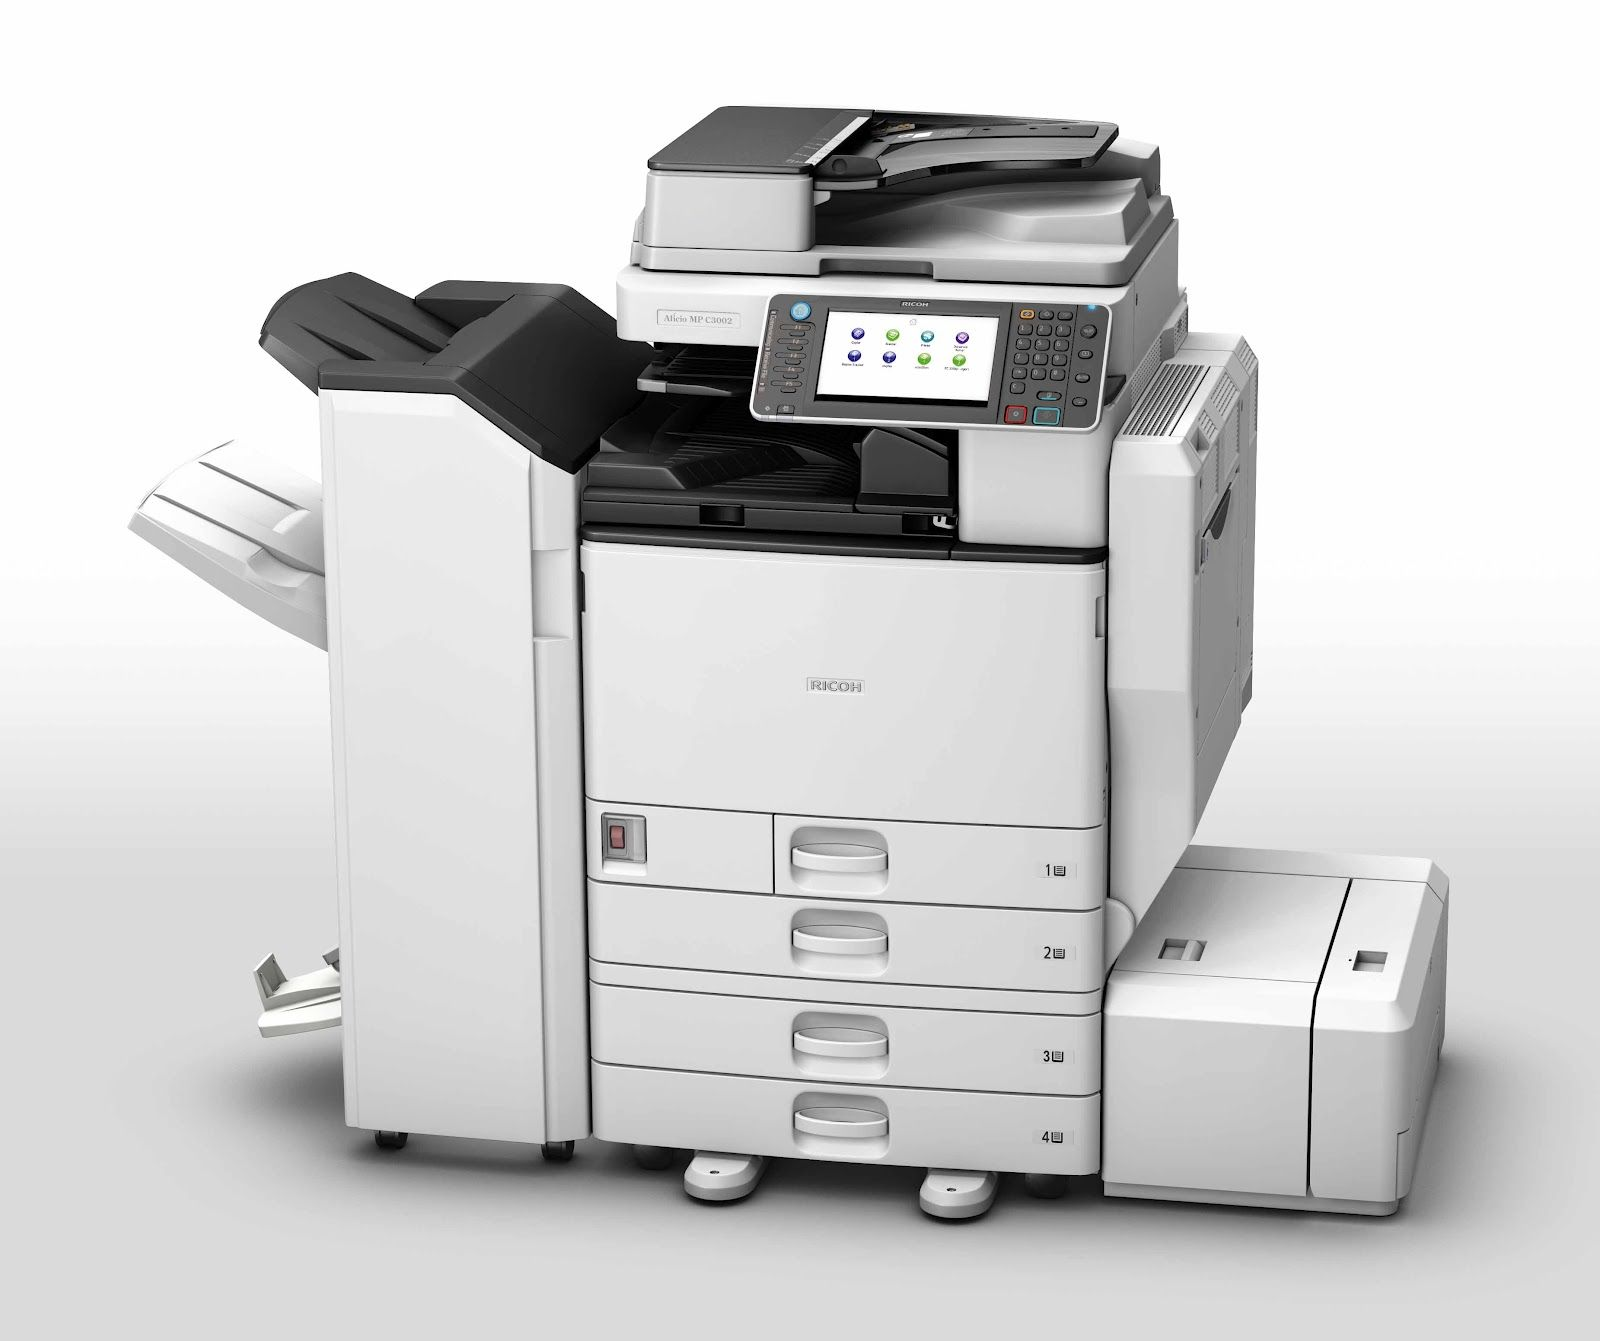 Old Xerox Machine Google Search Locker Storage Storage